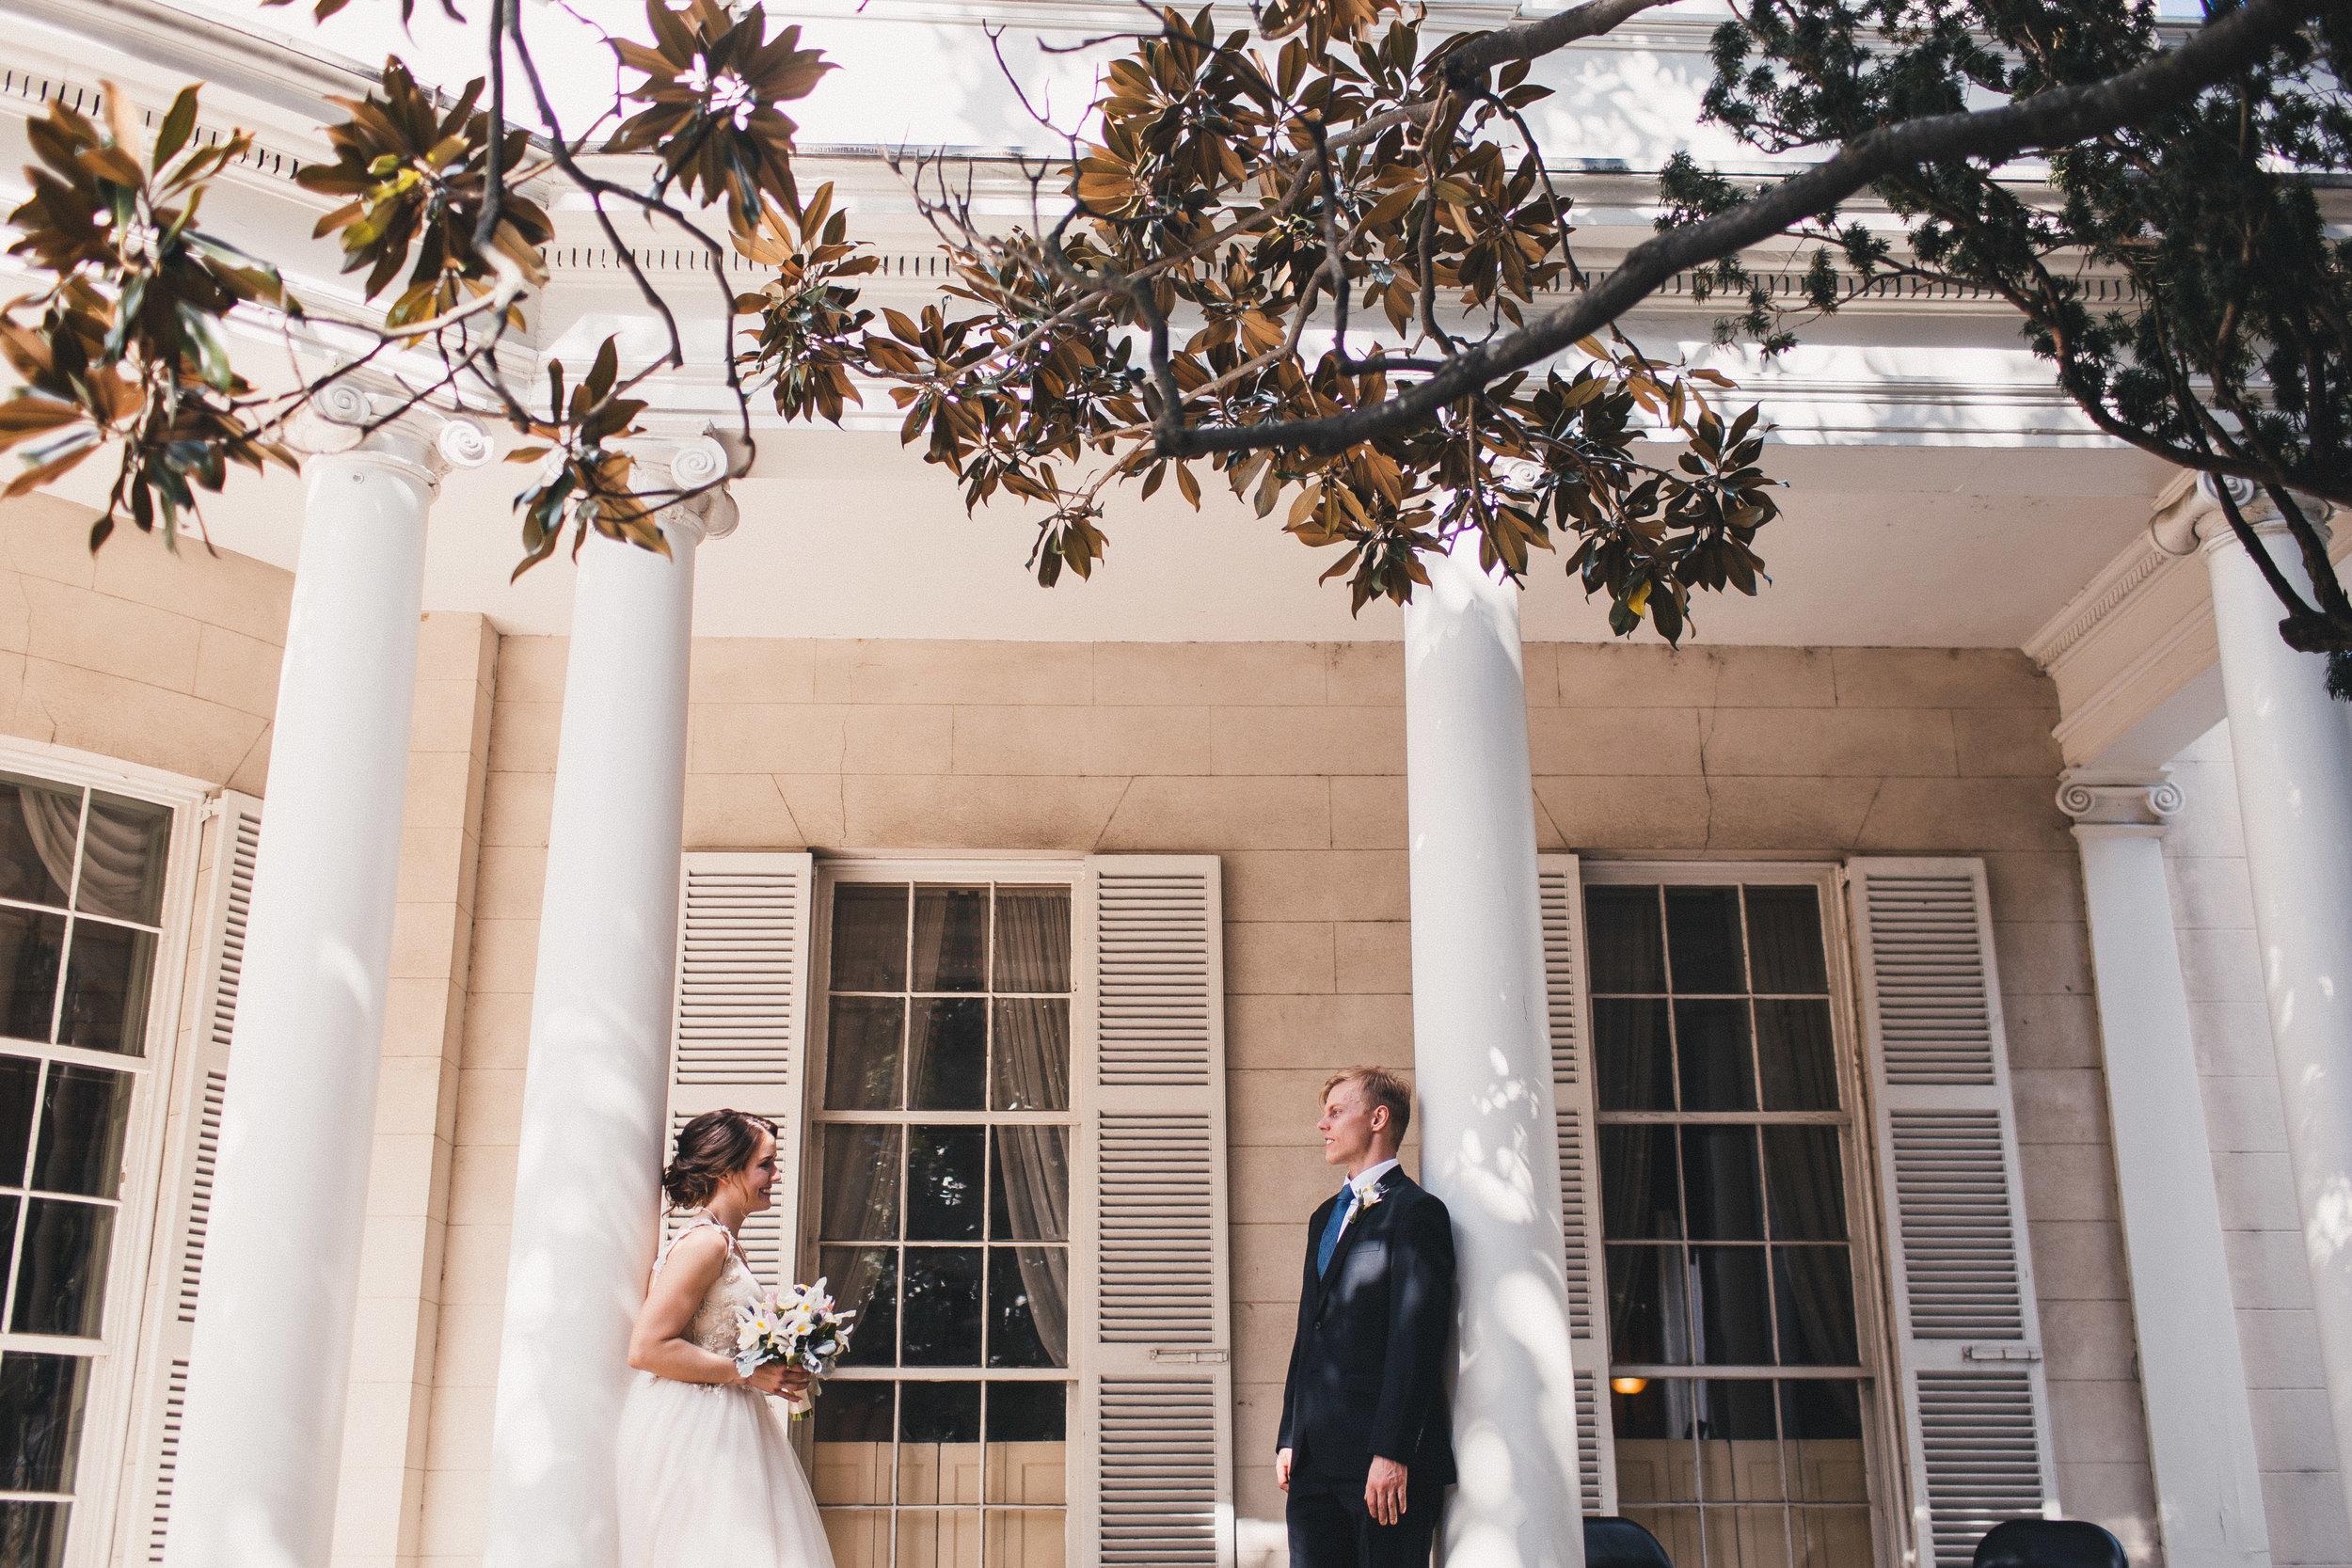 Lindsey & Bert - Wedding 4.1.17-415.jpg